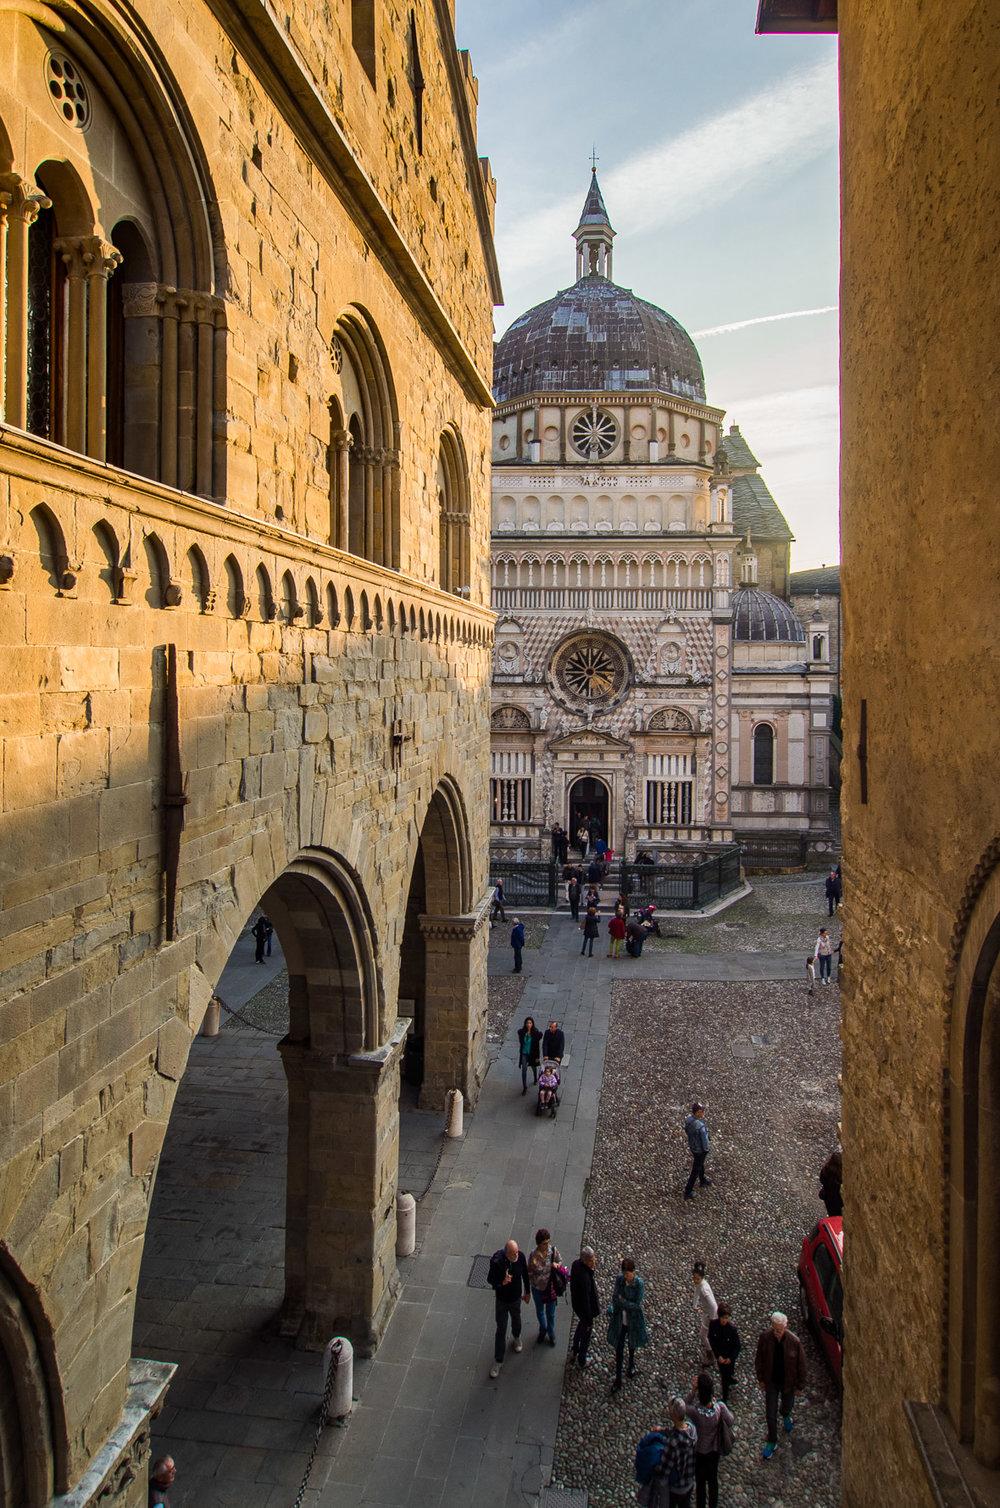 Palazzo Ragione met uitzicht op de Basilica di Santa Maria Maggi